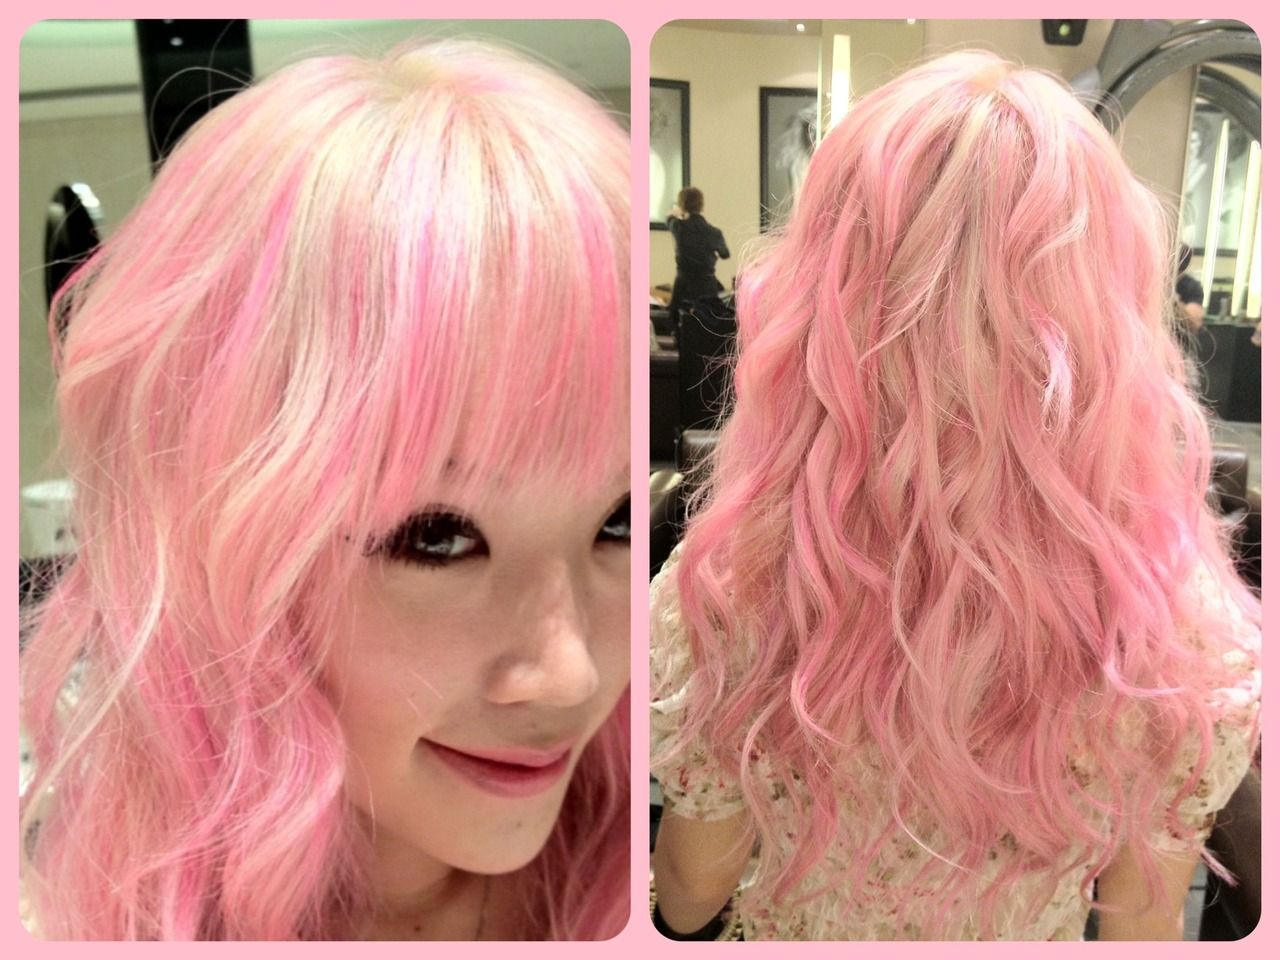 Baby pink streak hair with blonde. | Hair I Love | Pinterest | Pink ...